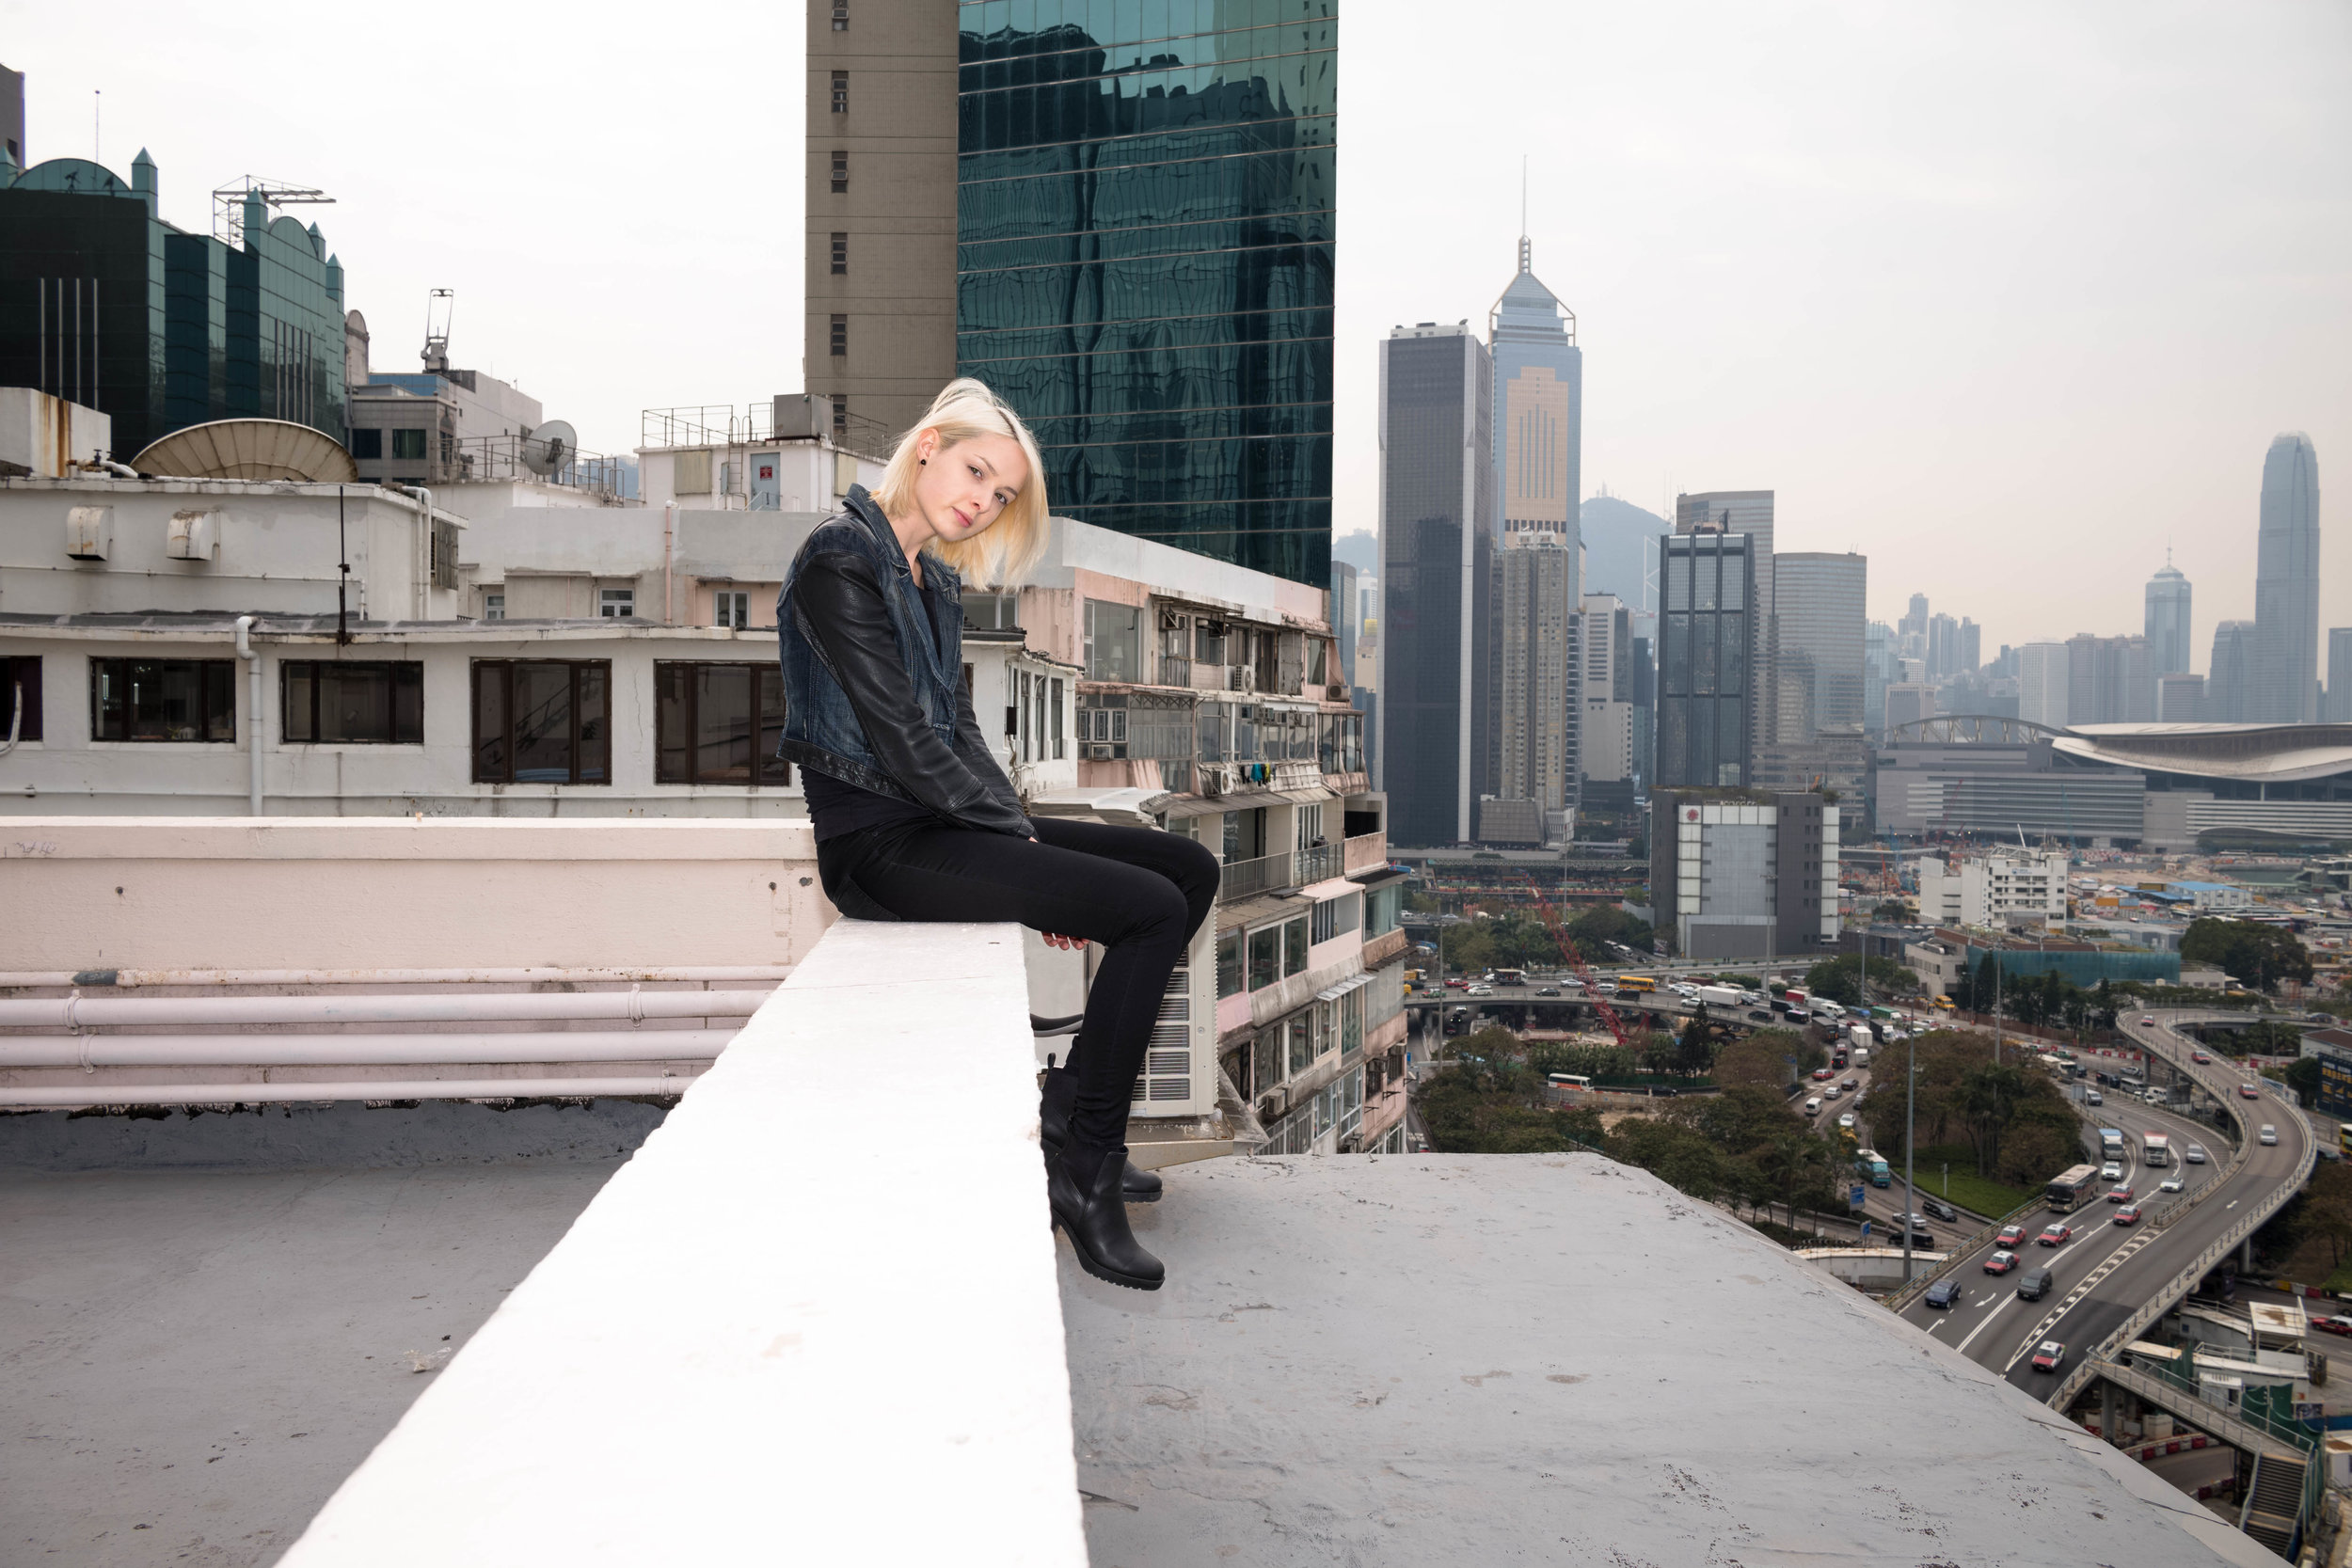 Sitting on the edge.